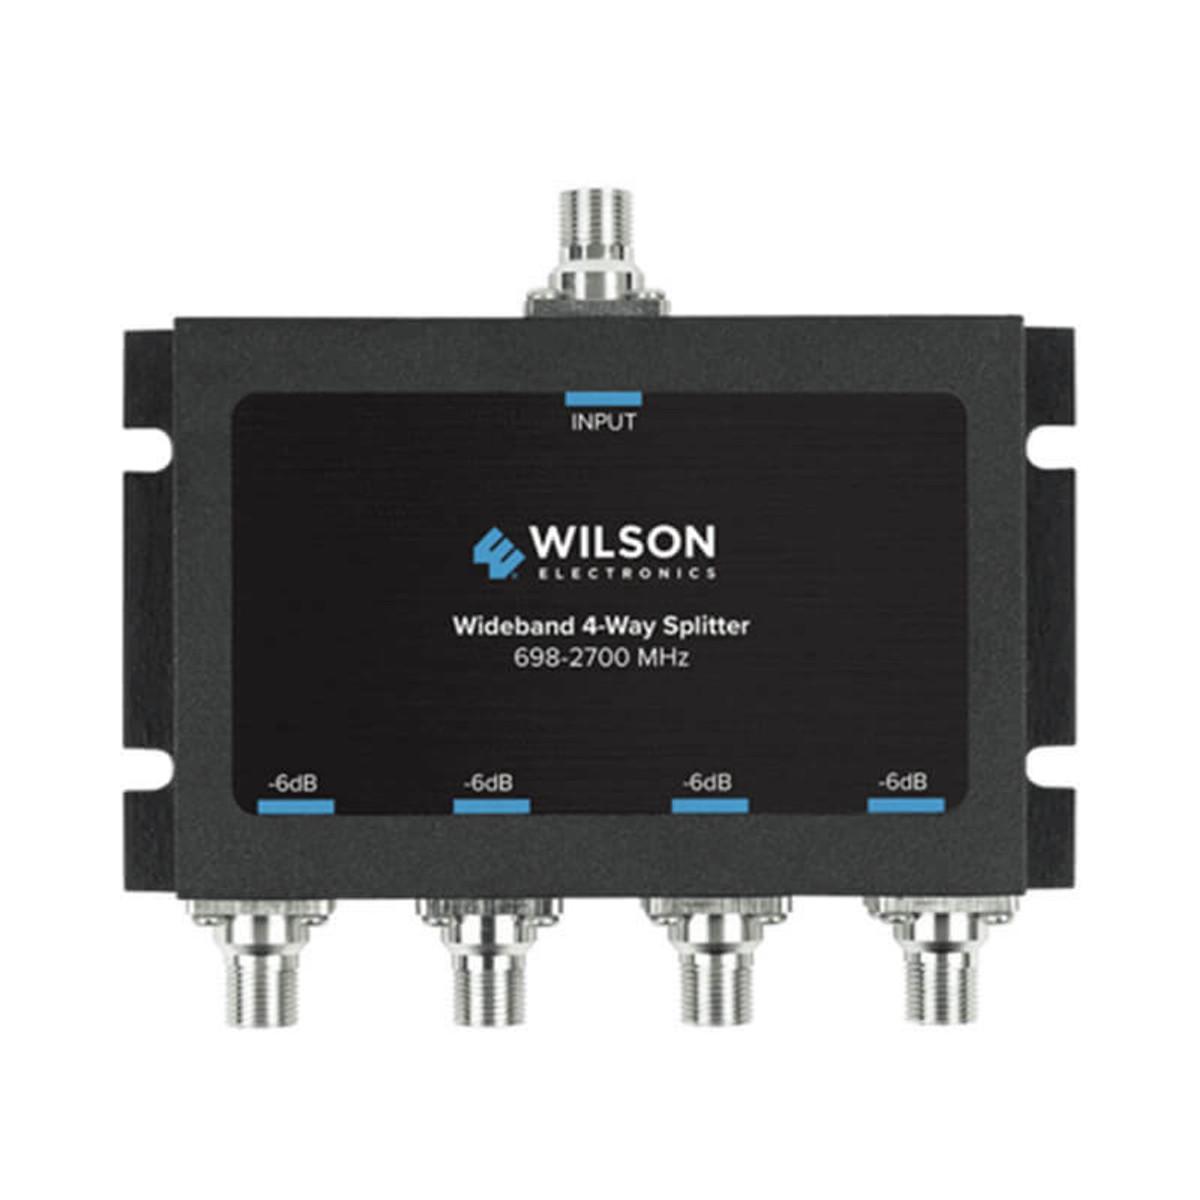 Wilson Electronics -6db 4-way Splitter for 698-2700 MHz 75ohm | 850036